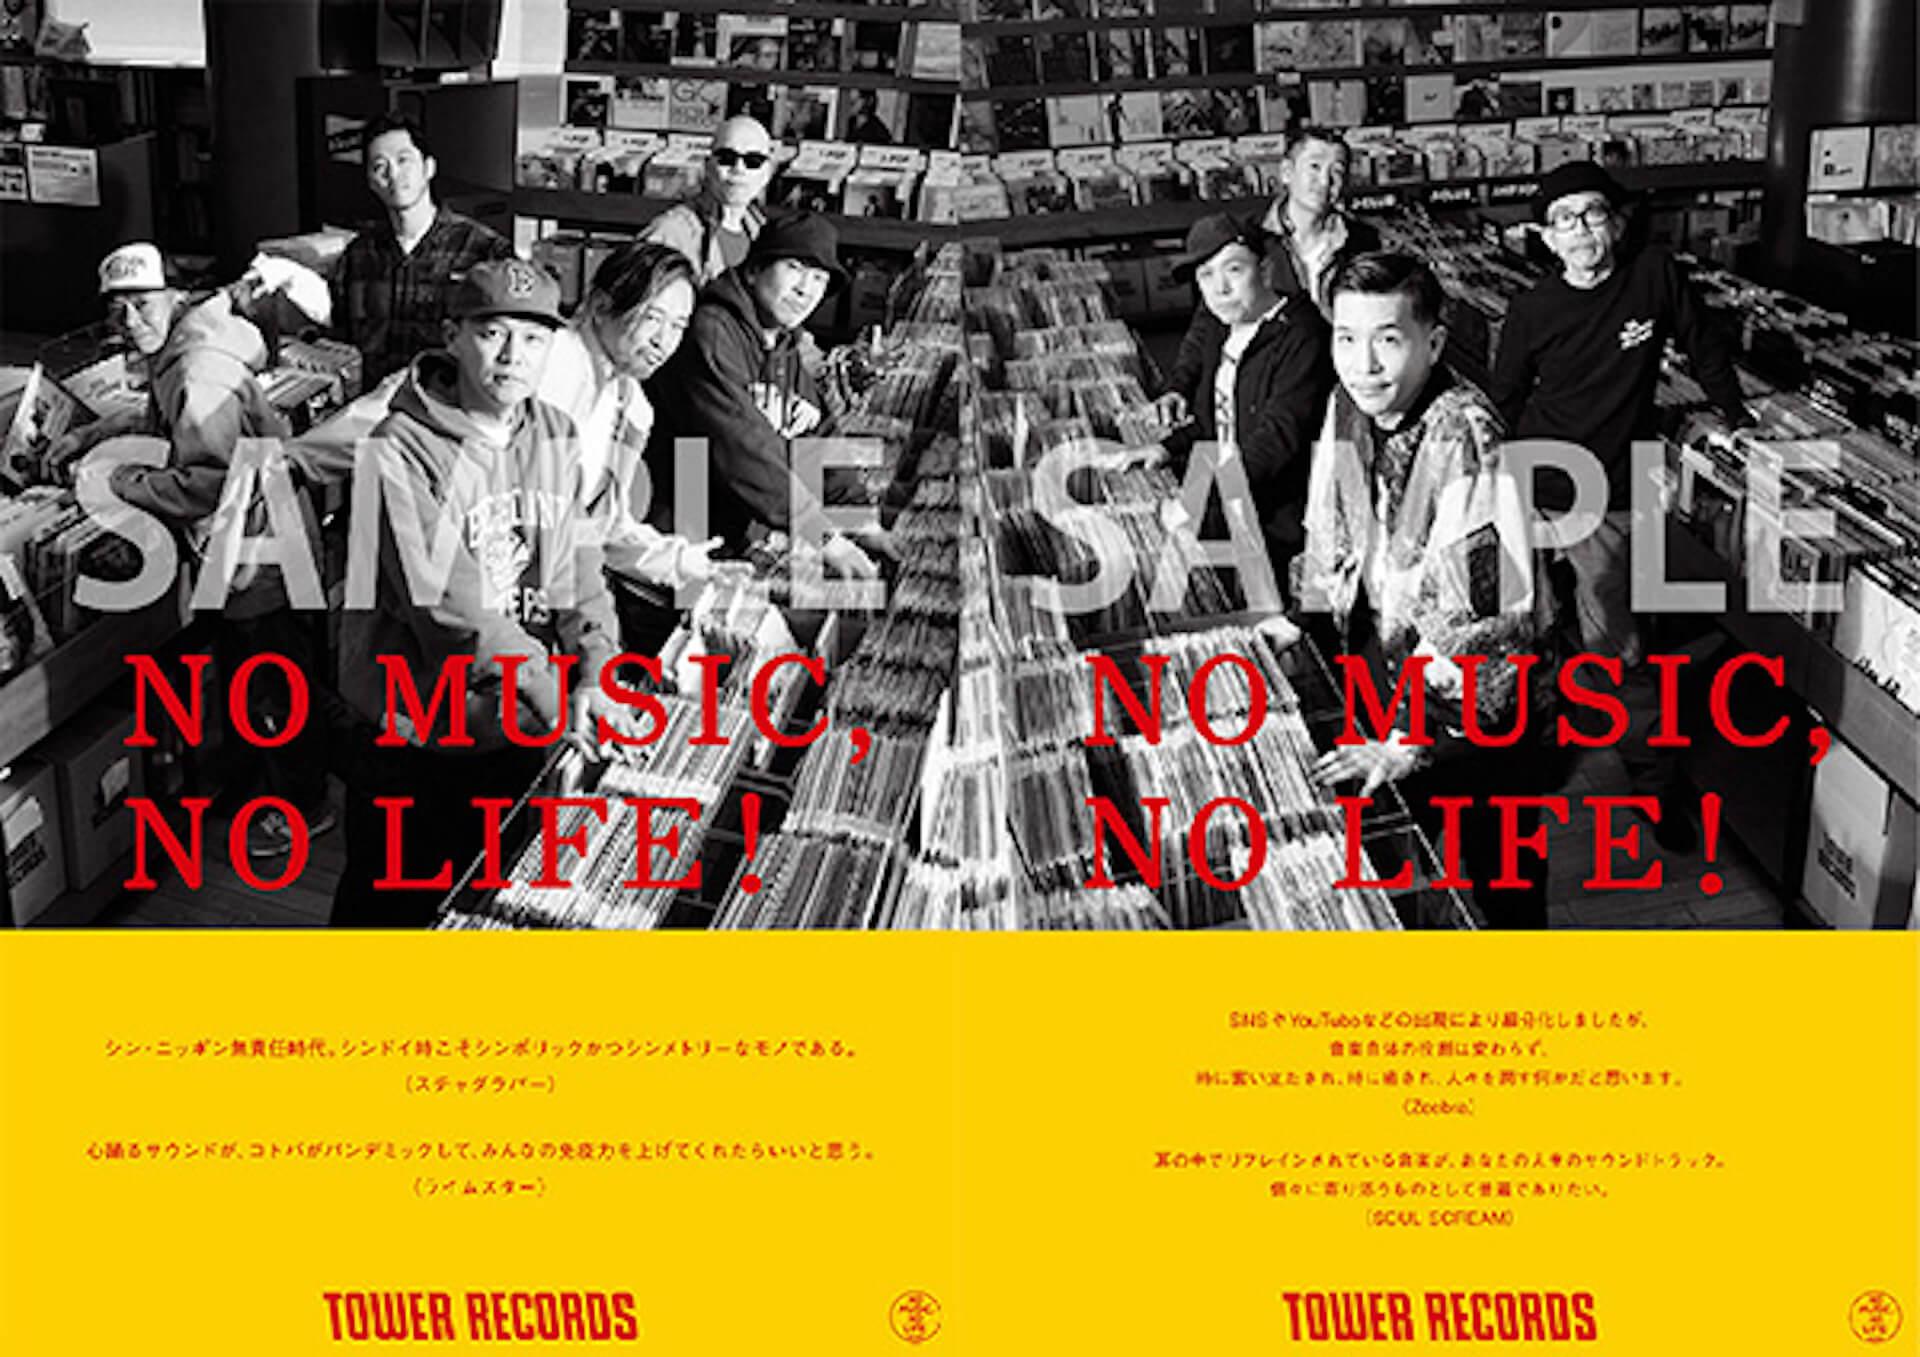 「NO MUSIC,NO LIFE.」ポスターに日本語ラップレジェンドのスチャダラパー×ライムスター、Zeebra×SOUL SCREAMが登場! music200406_nomusicnolife_06